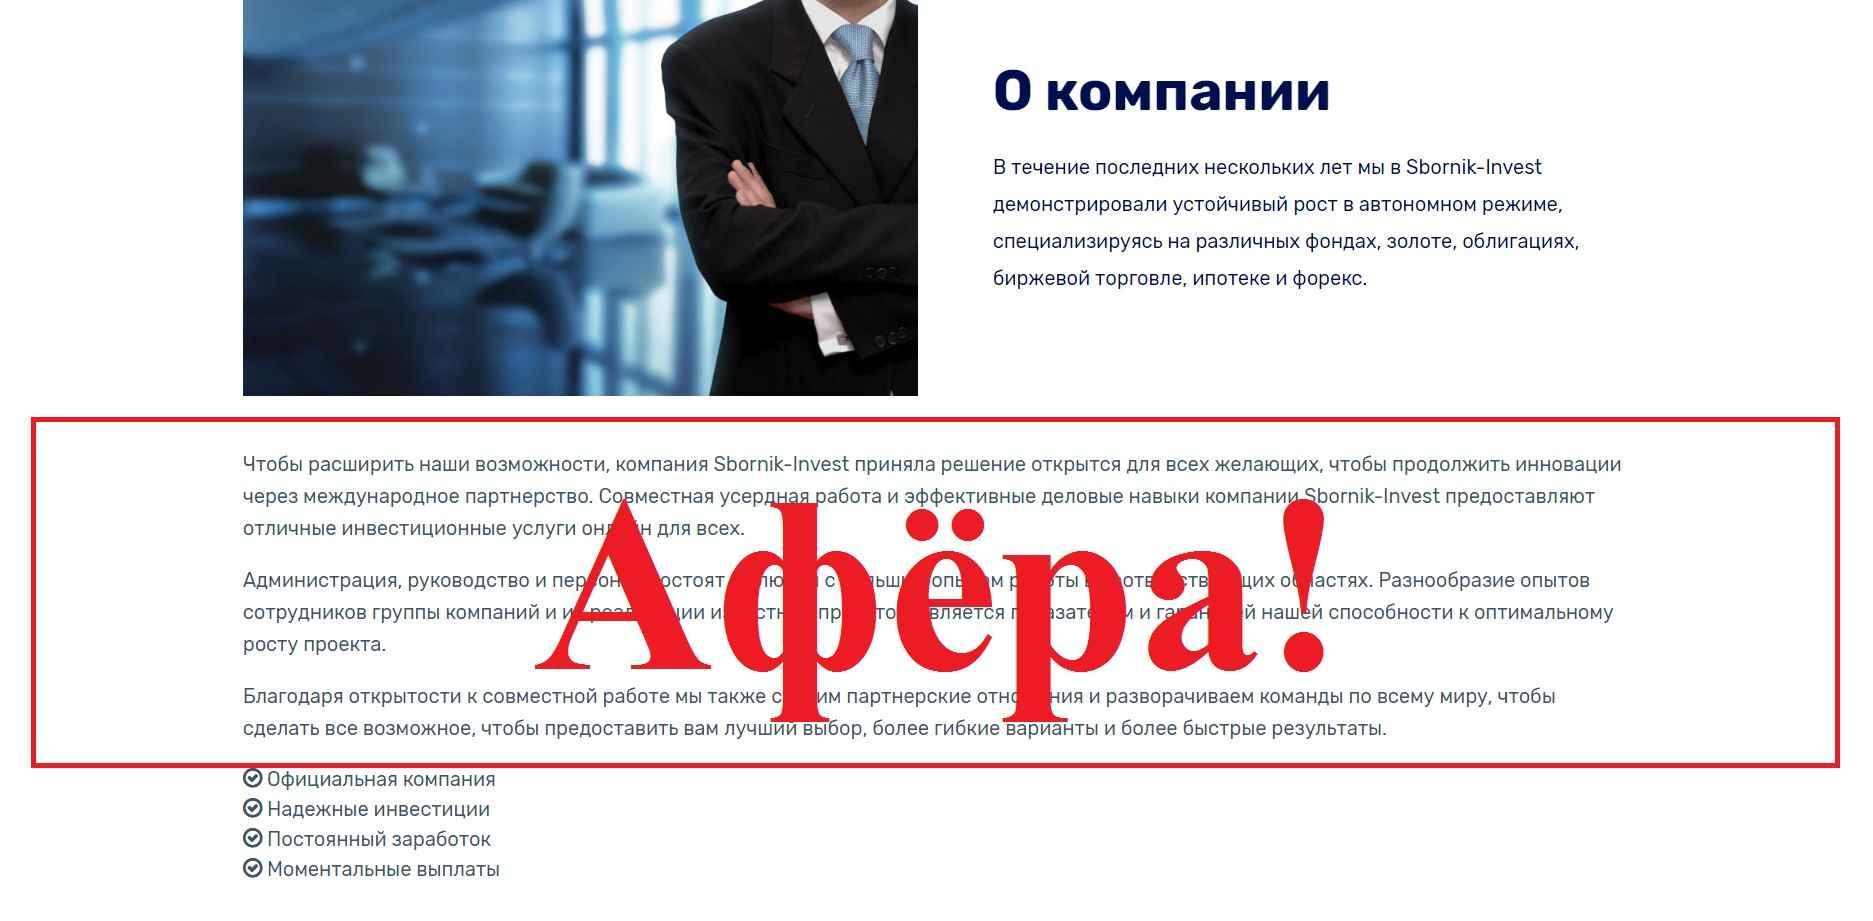 Sbornik Invest – отзывы об инвестиционных sbornik-invest.vip